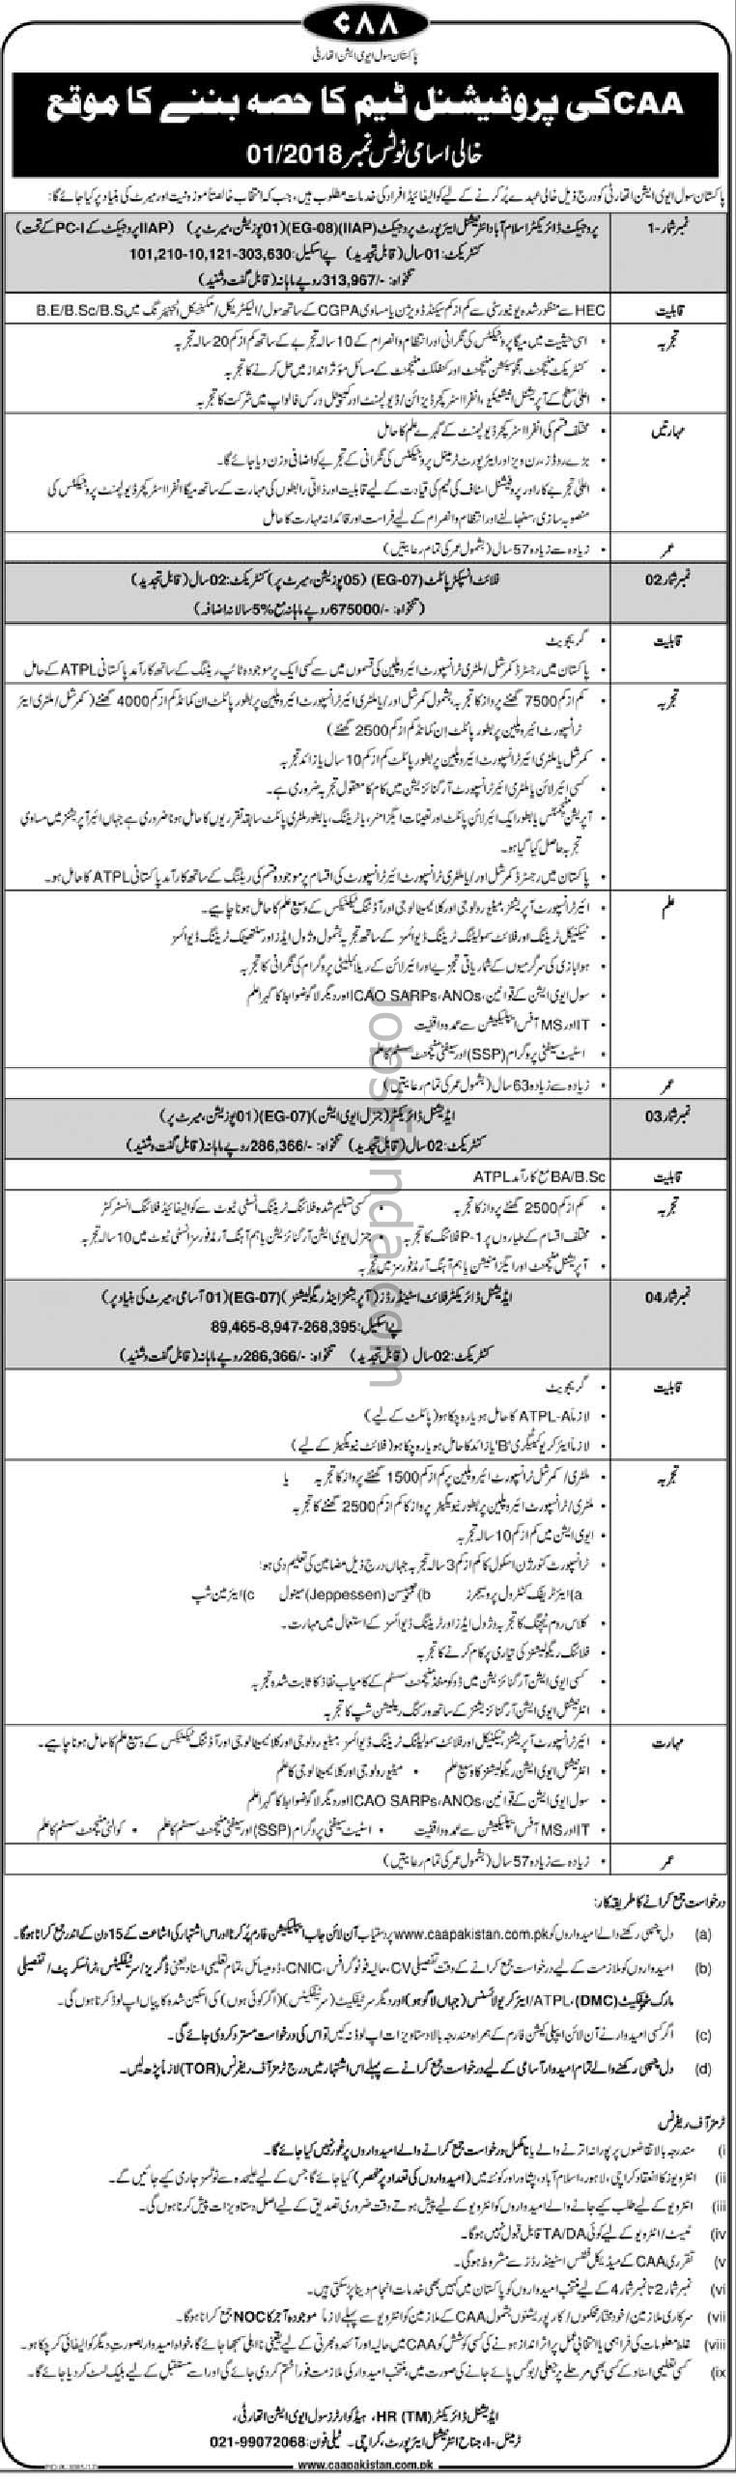 Pakistan Civil Aviation Authority CAA Jobs 2018 In Karachi For Aviation And Management Staff https://www.jobsfanda.com/pakistan-civil-aviation-authority-caa-jobs-2018-in-karachi-for-aviation-and-management-staff/